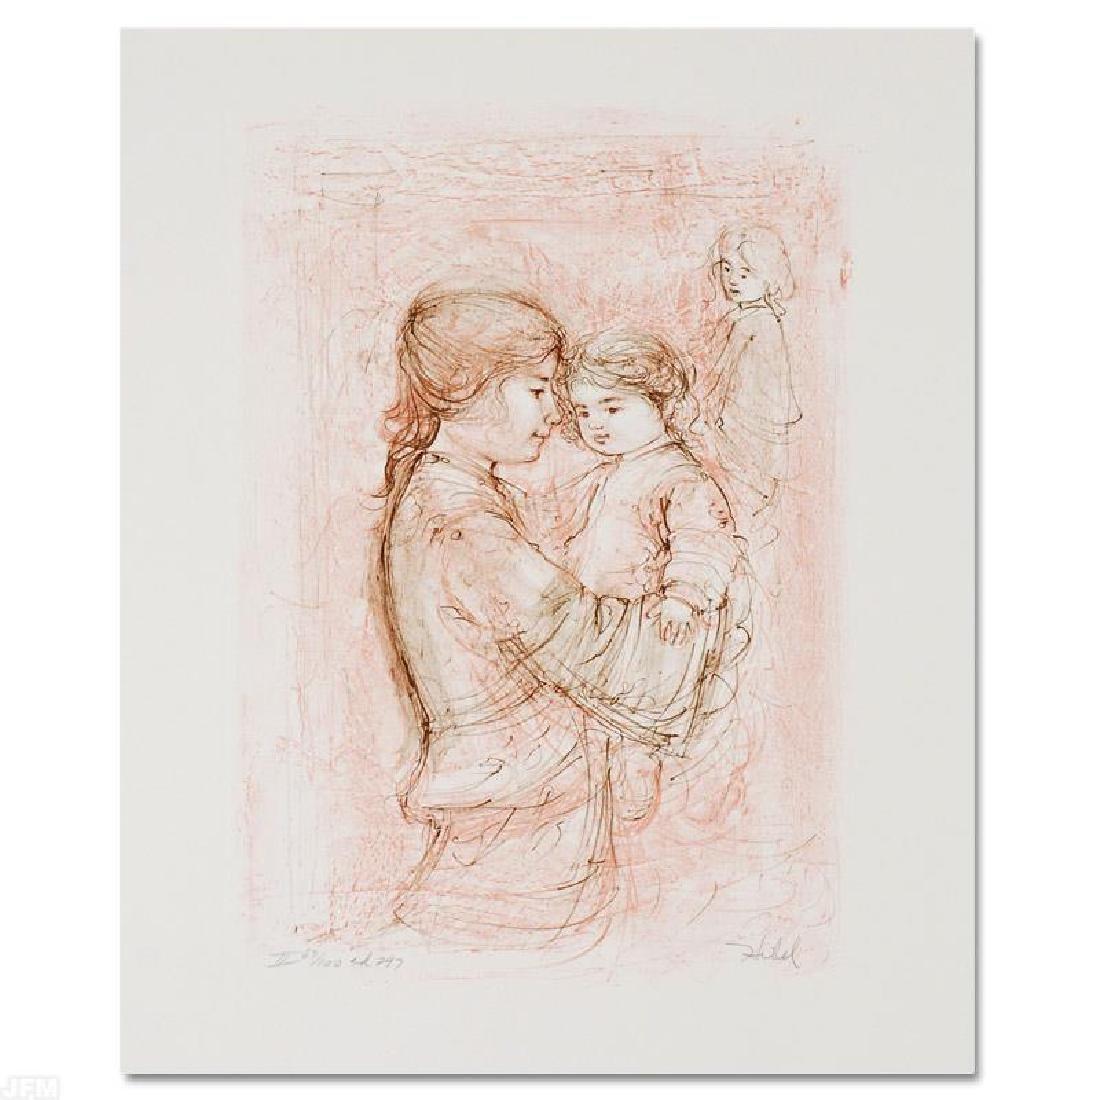 Nicole with Baby by Hibel (1917-2014)